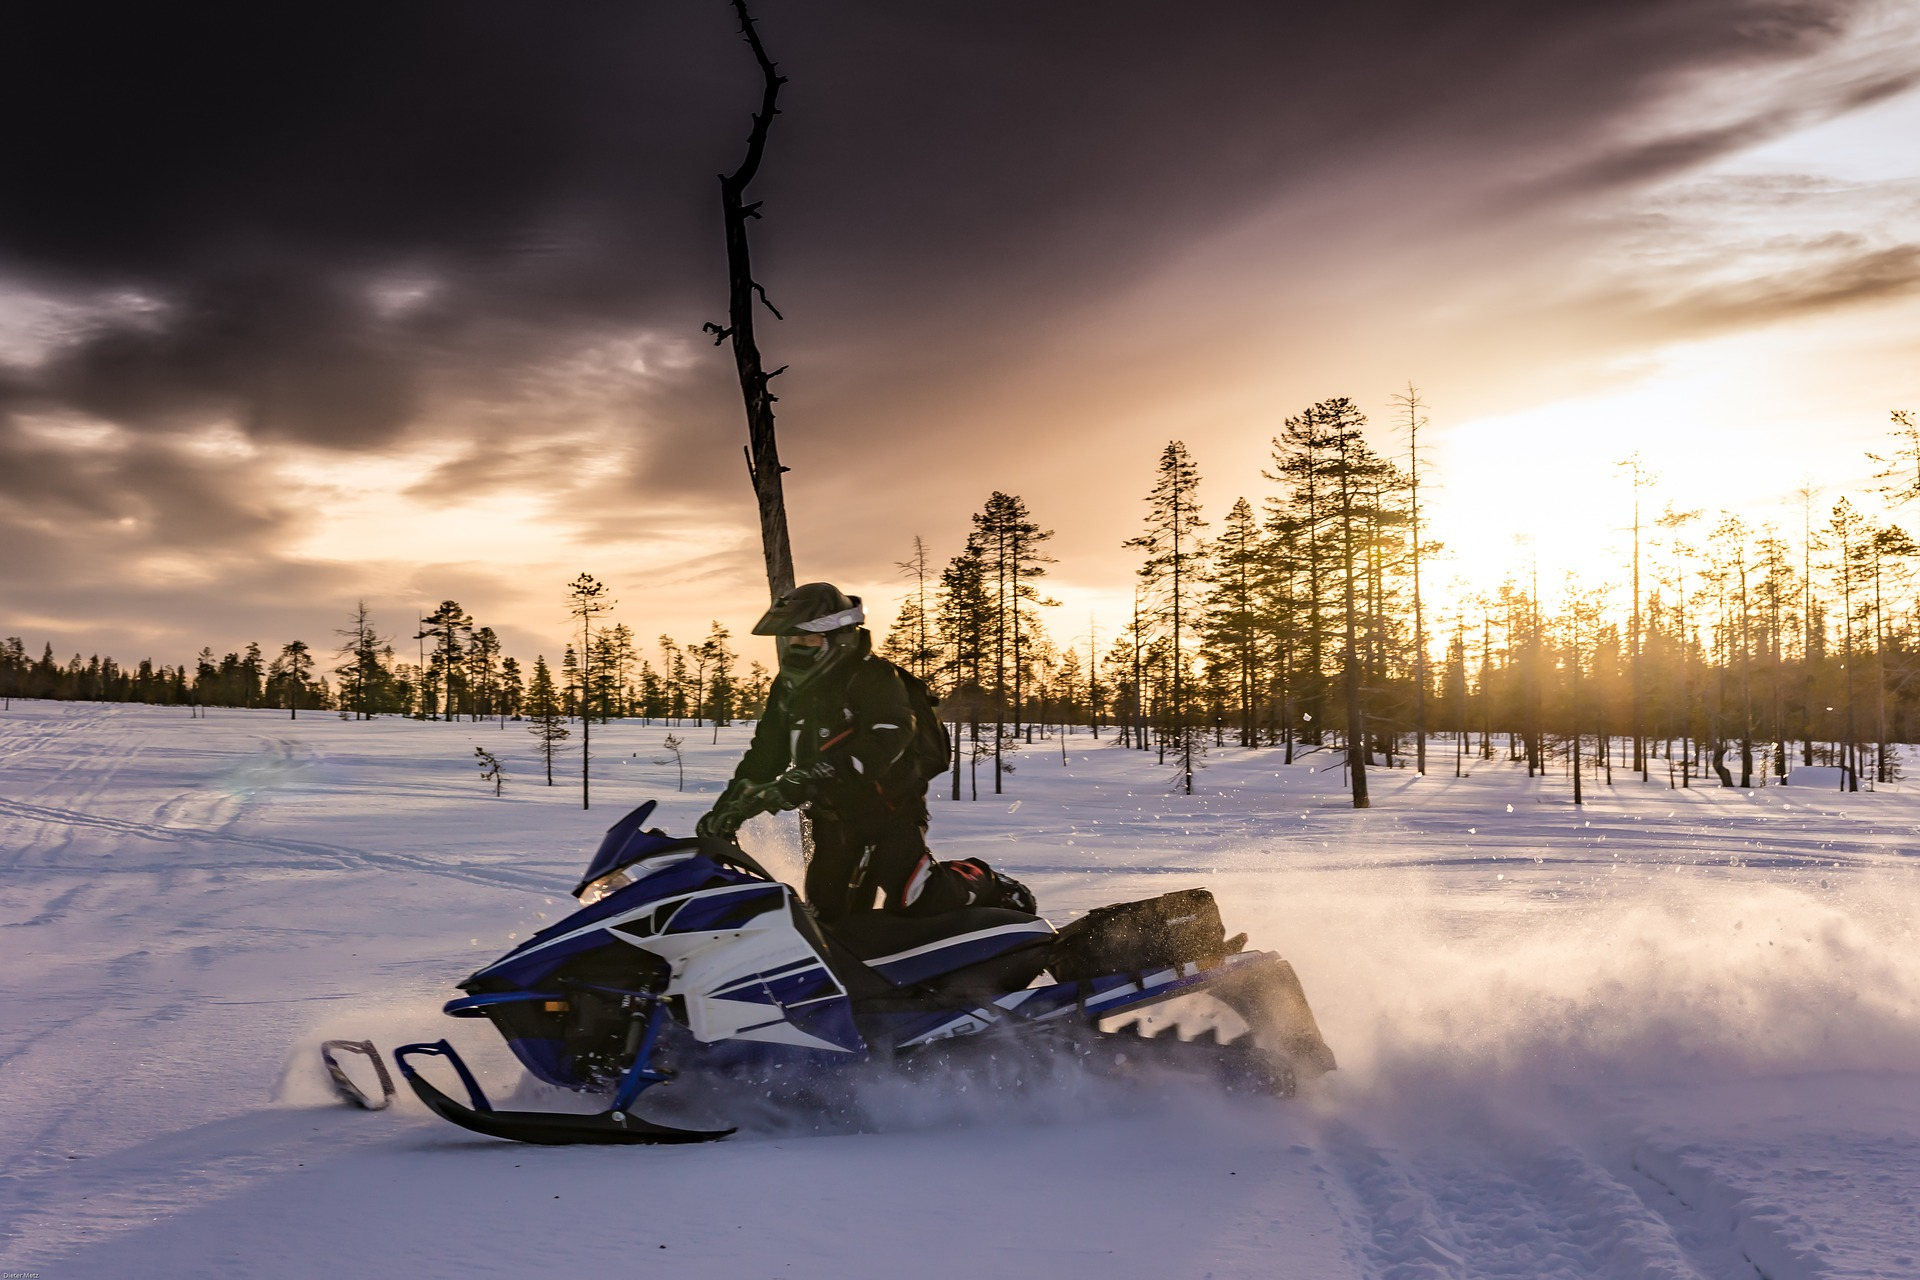 ATV and Snowmobile For Powersport Fun This Winter Season